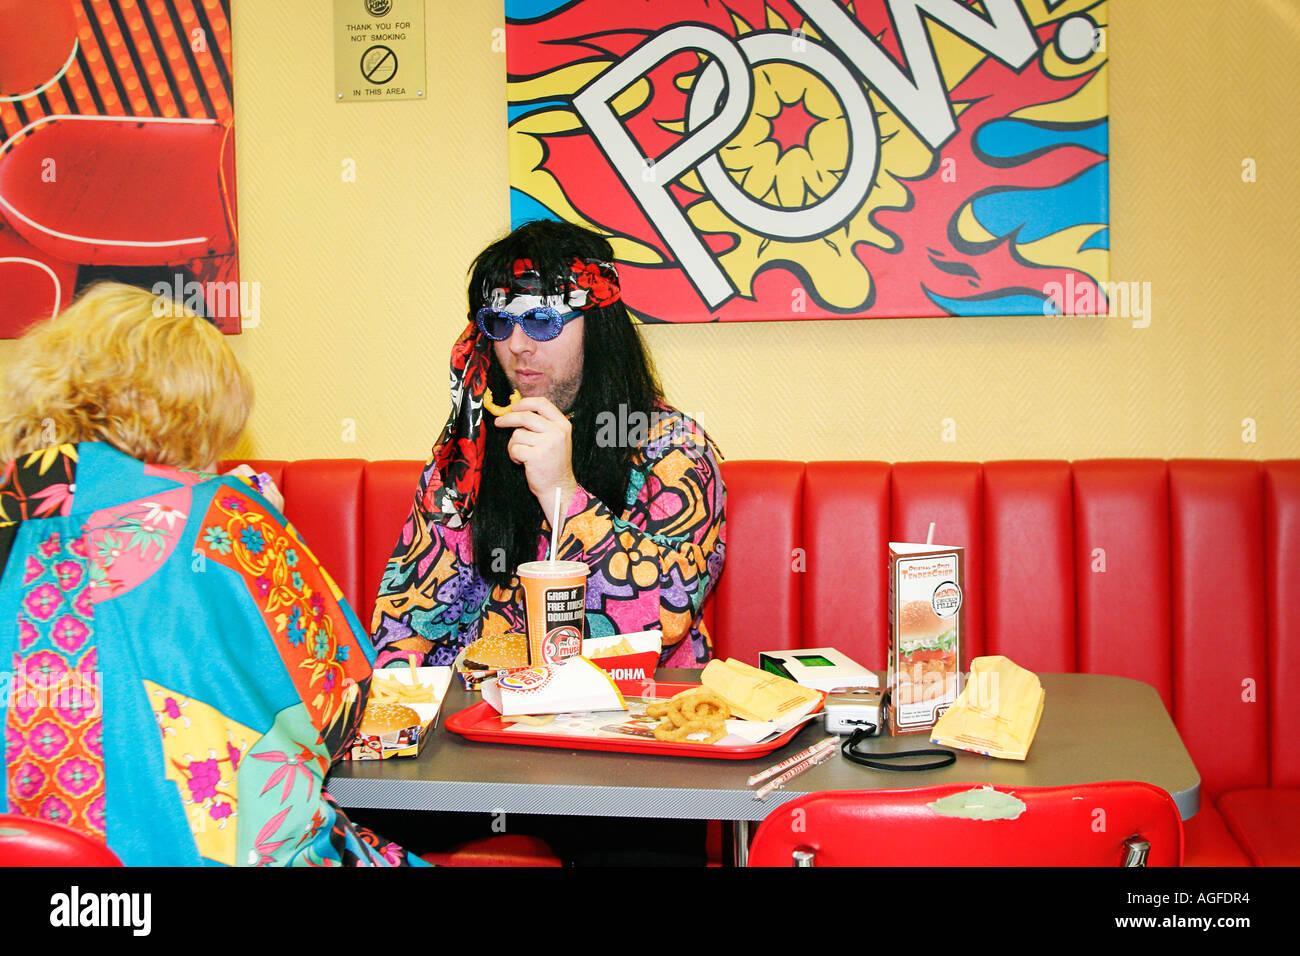 Burger King at 1970s Extravaganza at Butlins Bognor Regis - Stock Image